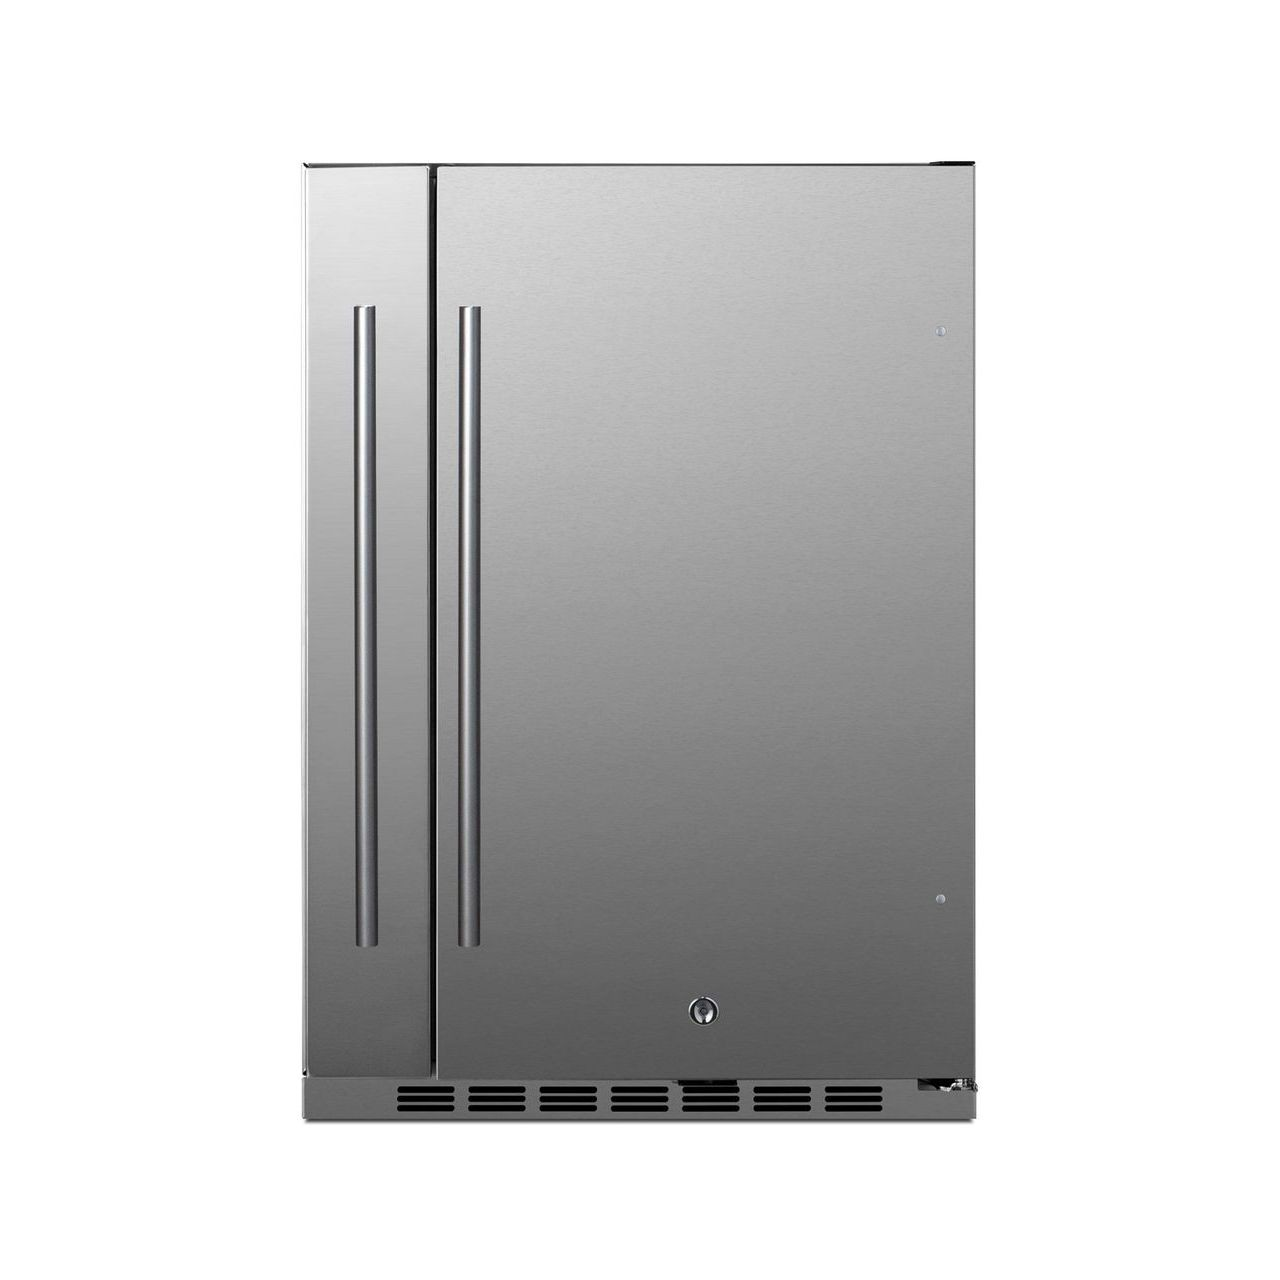 "Summit Shallow Depth 24"" Built-In All-Refrigerator/Storage - Outdoor"